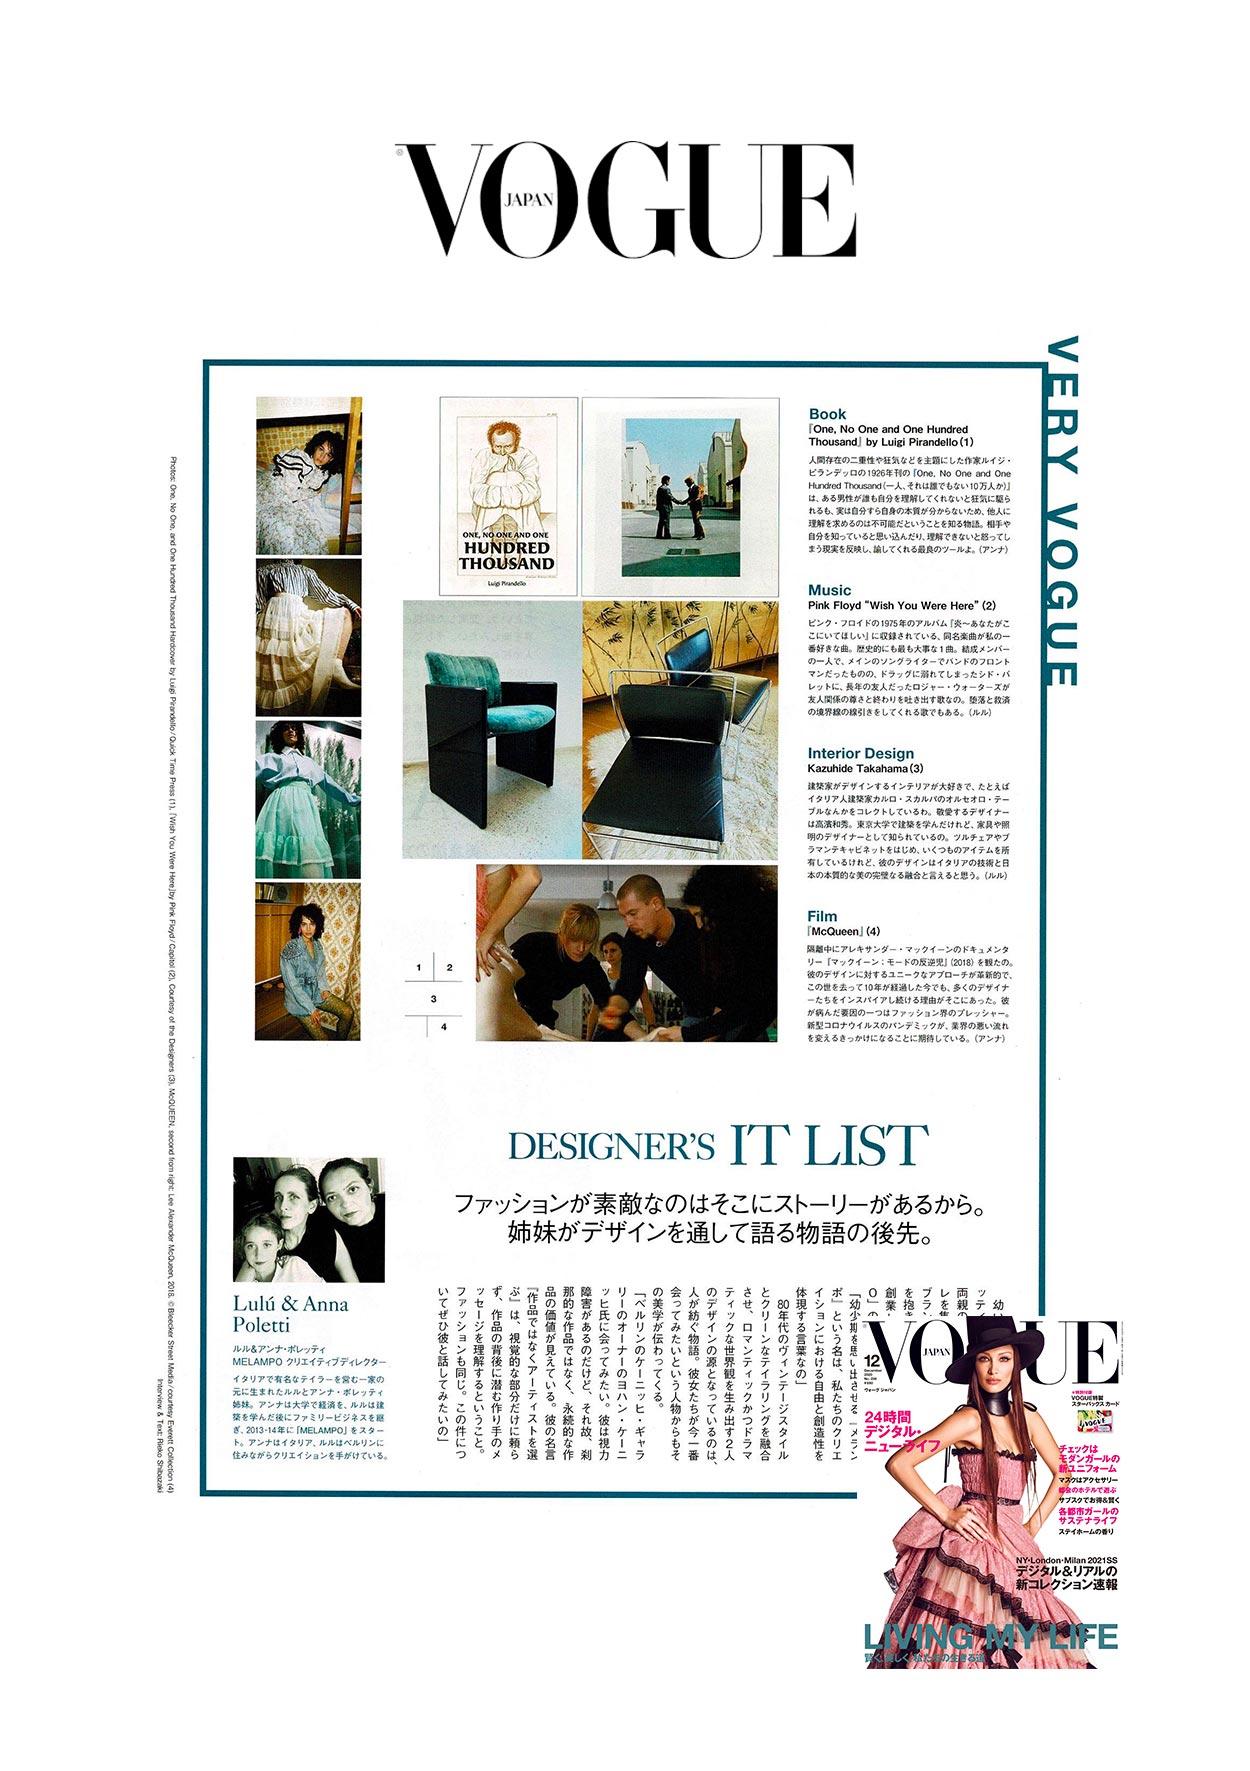 melampo interview on vogue Japan magazine